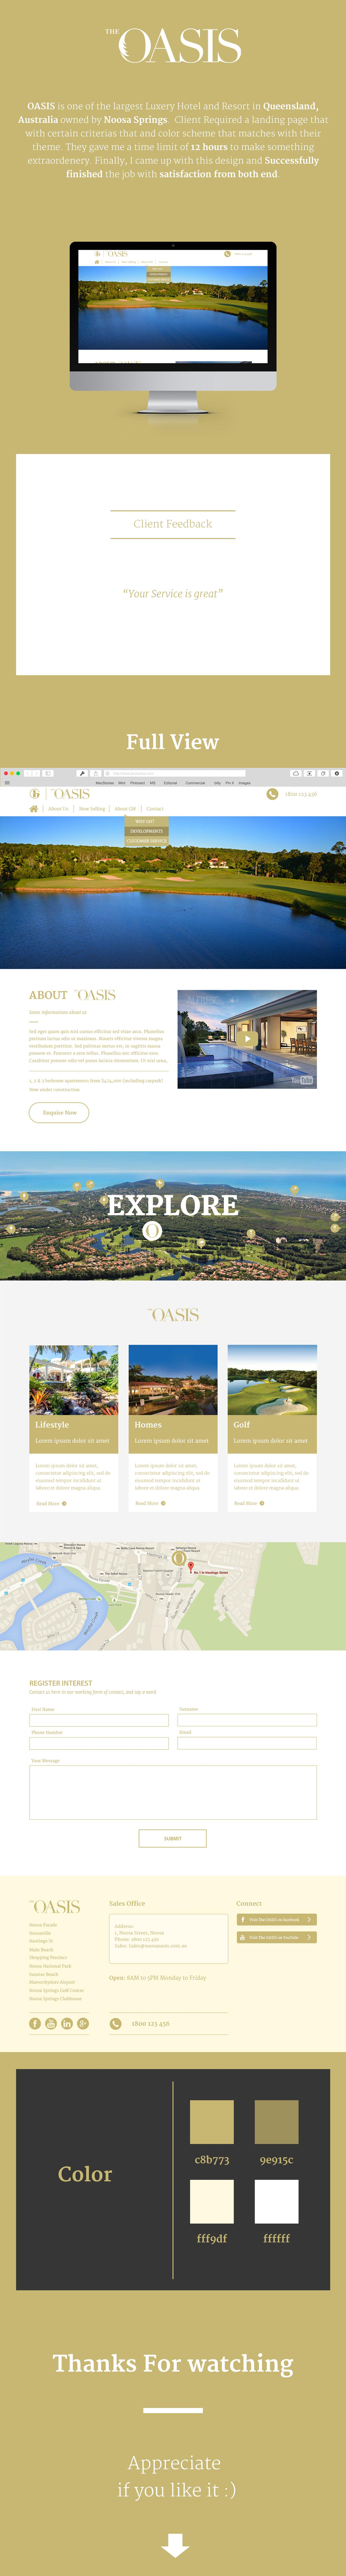 wensite web layout clean flat austrslia oasis noosa spring Queensland hotel luxury elegant golden GH Australia